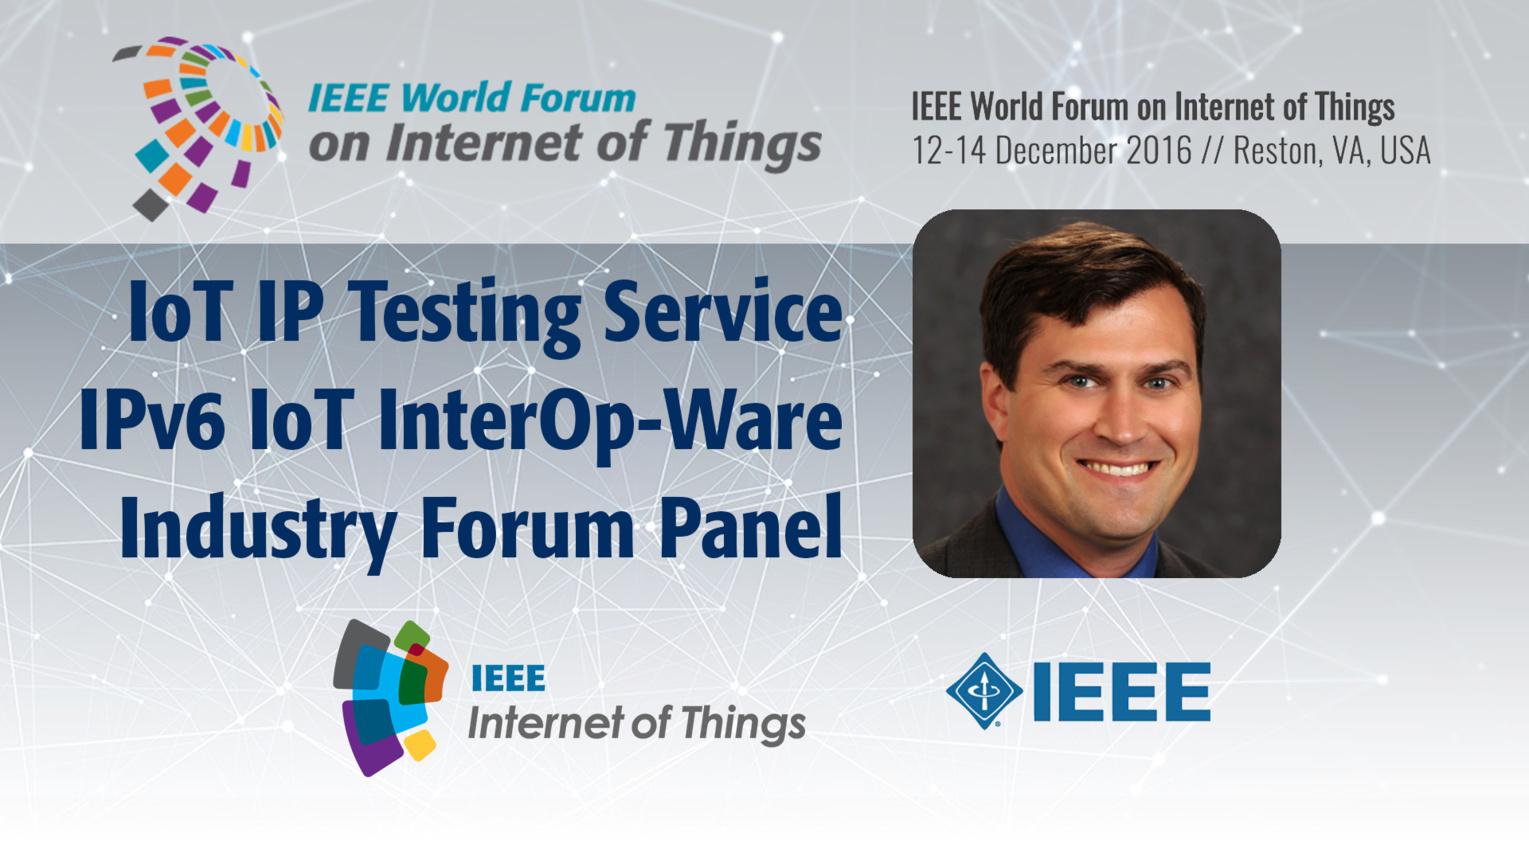 Tim Winters: Internet of Things IP Testing Service - IPv6 IoT InterOp-Ware Industry Forum Panel: WF IoT 2016